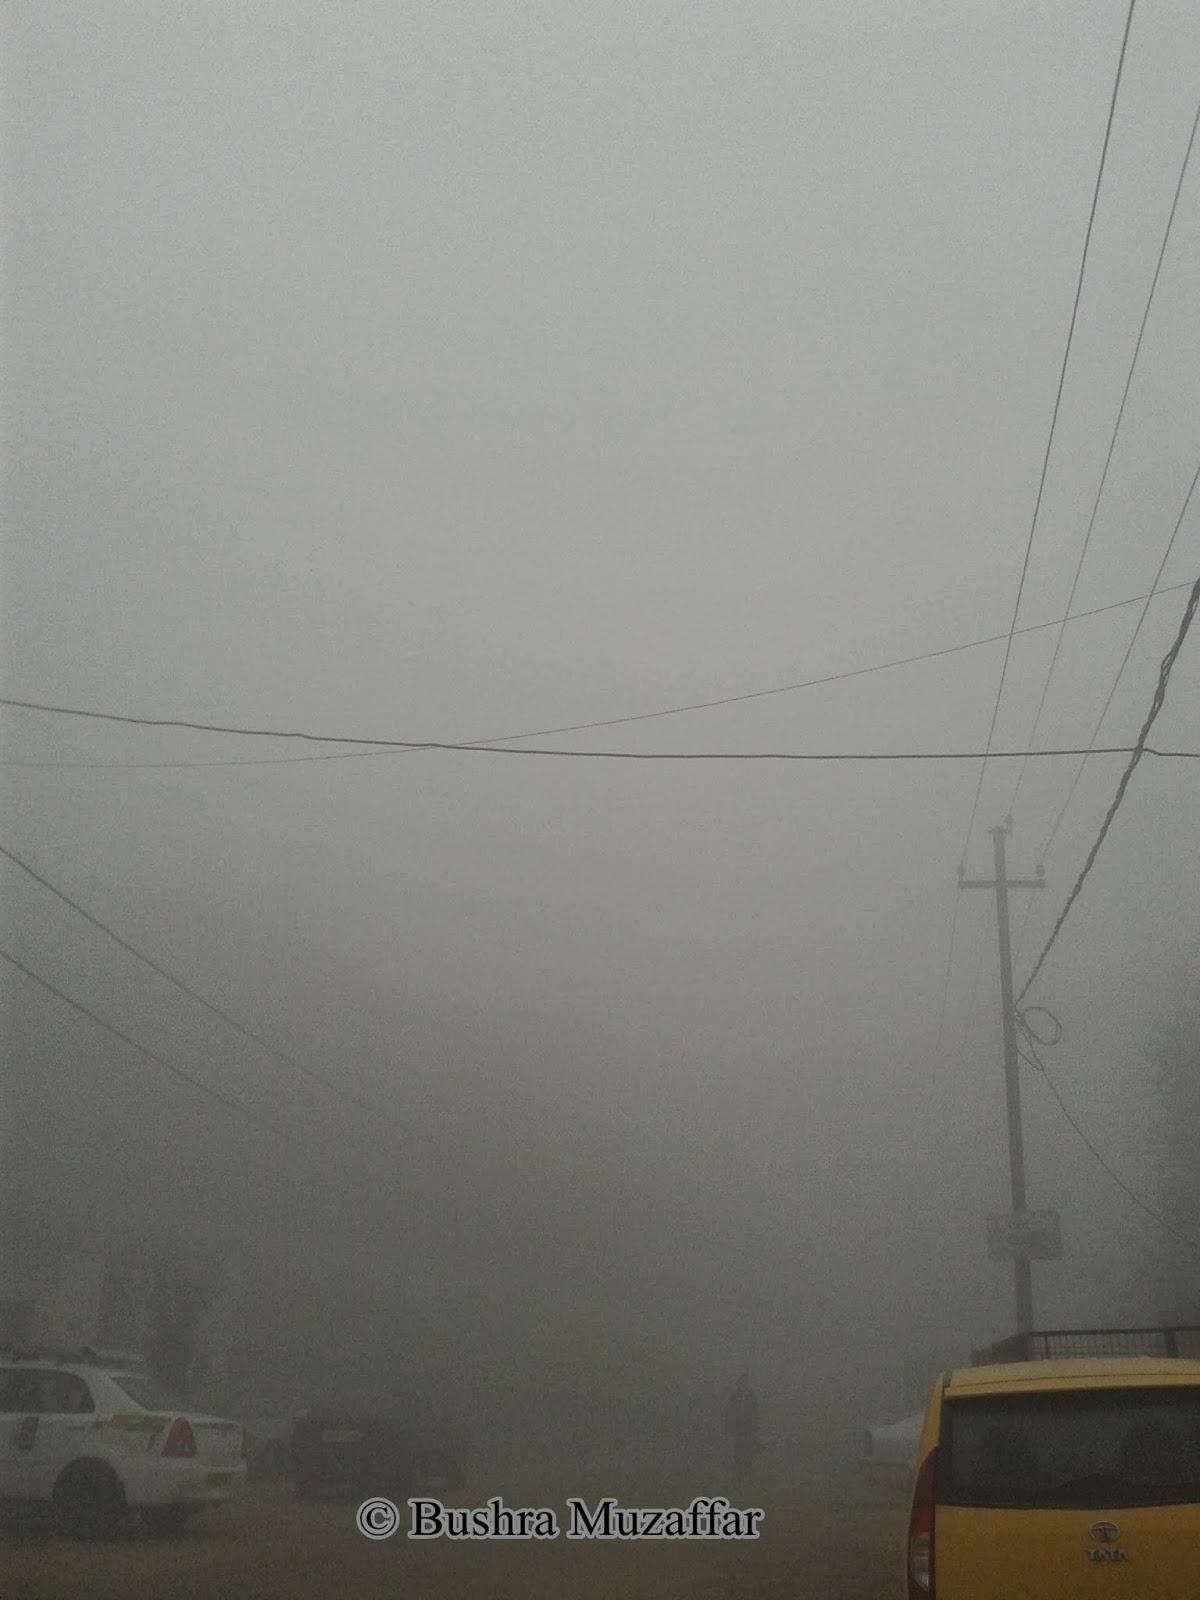 Fog in Noida, December 2013